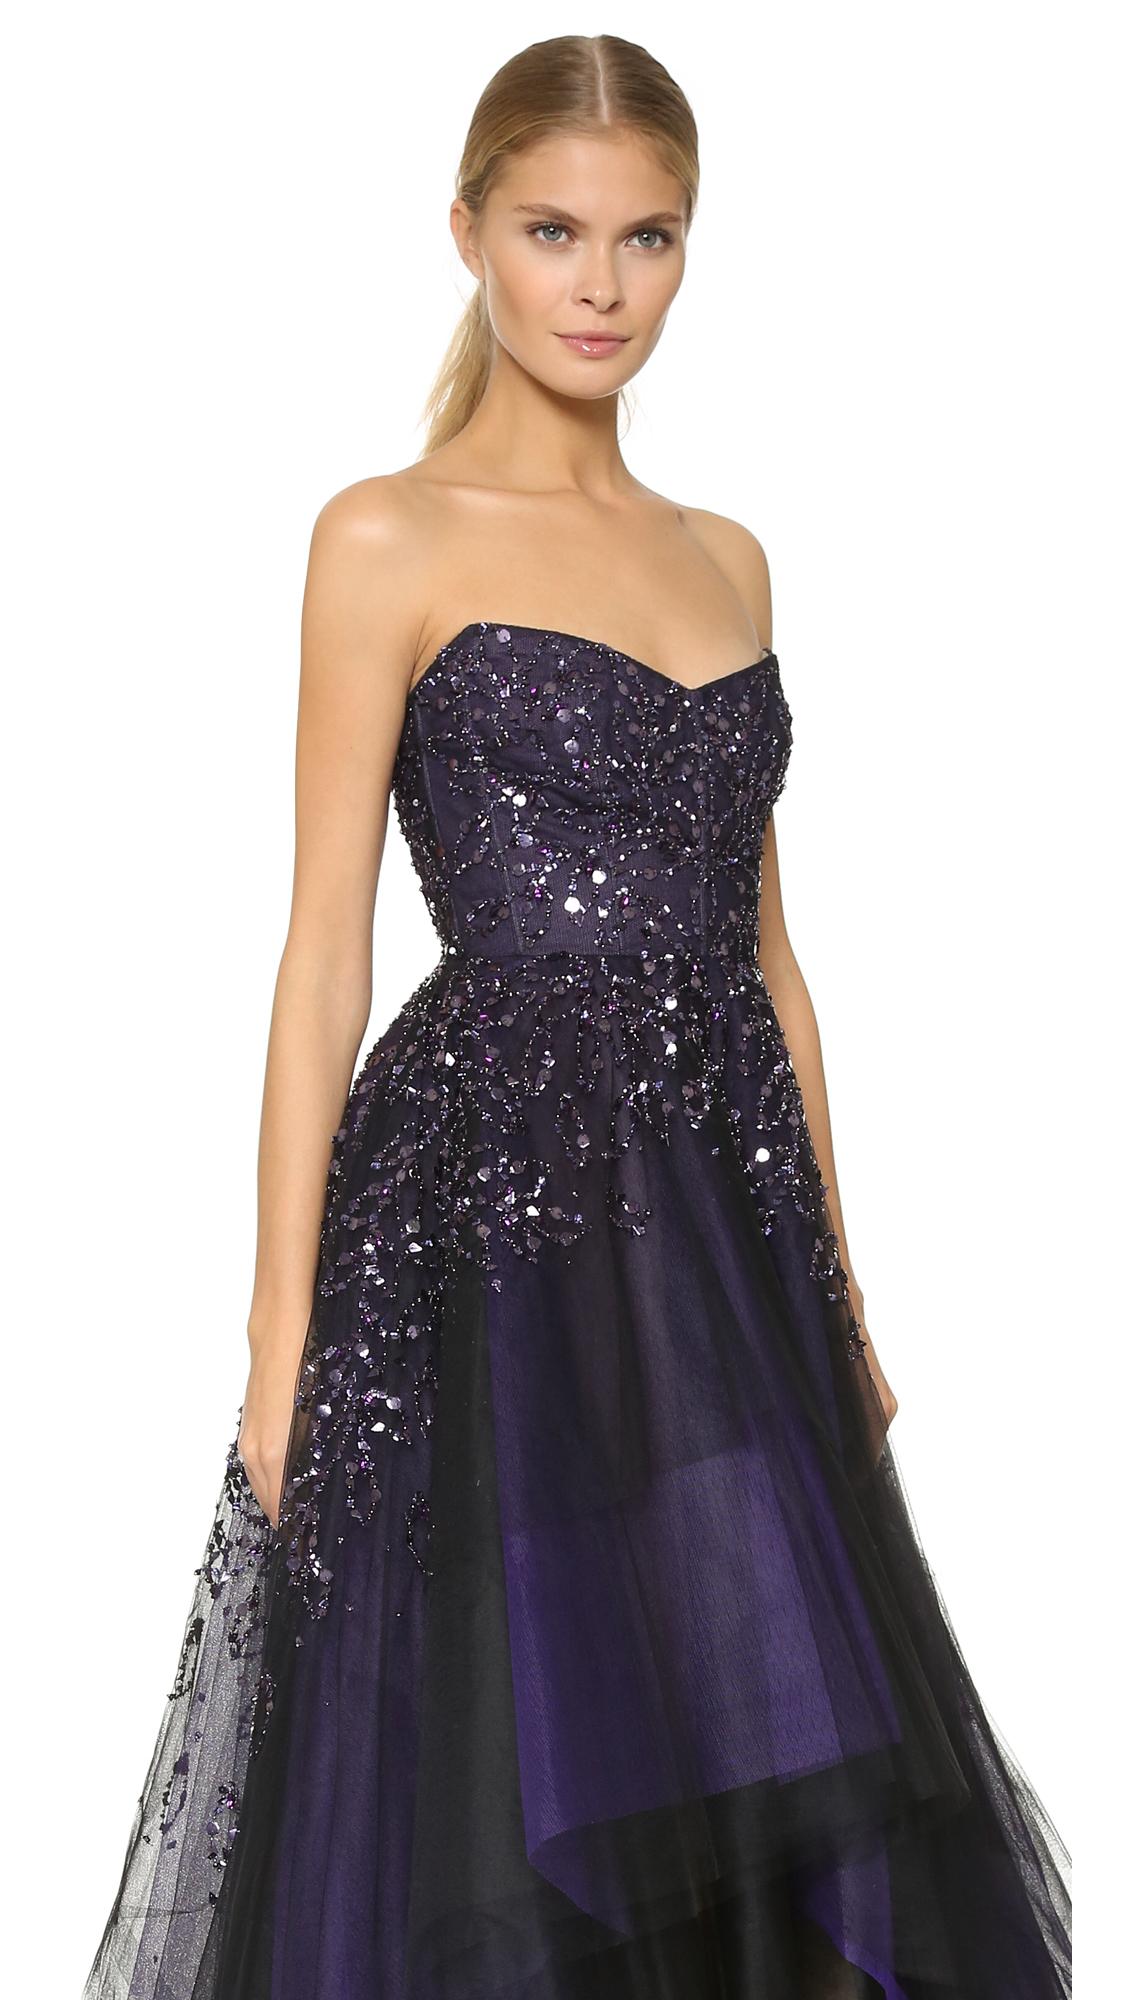 Monique Lhuillier Strapless Ball Gown - Deep Plum in Purple - Lyst